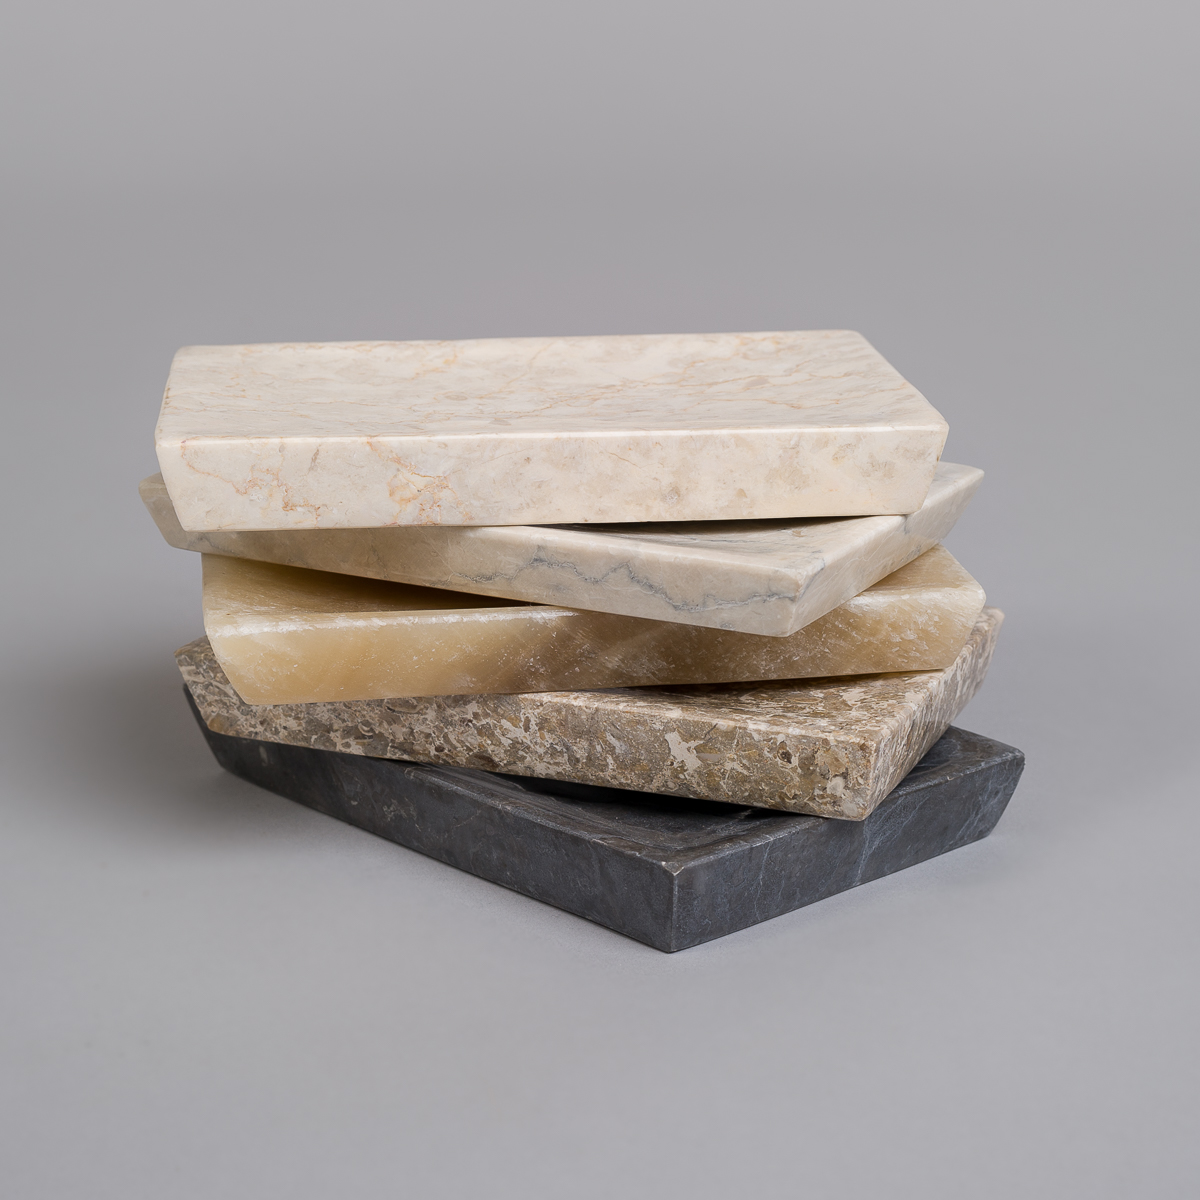 Såpekopp i marmor-Grå-155